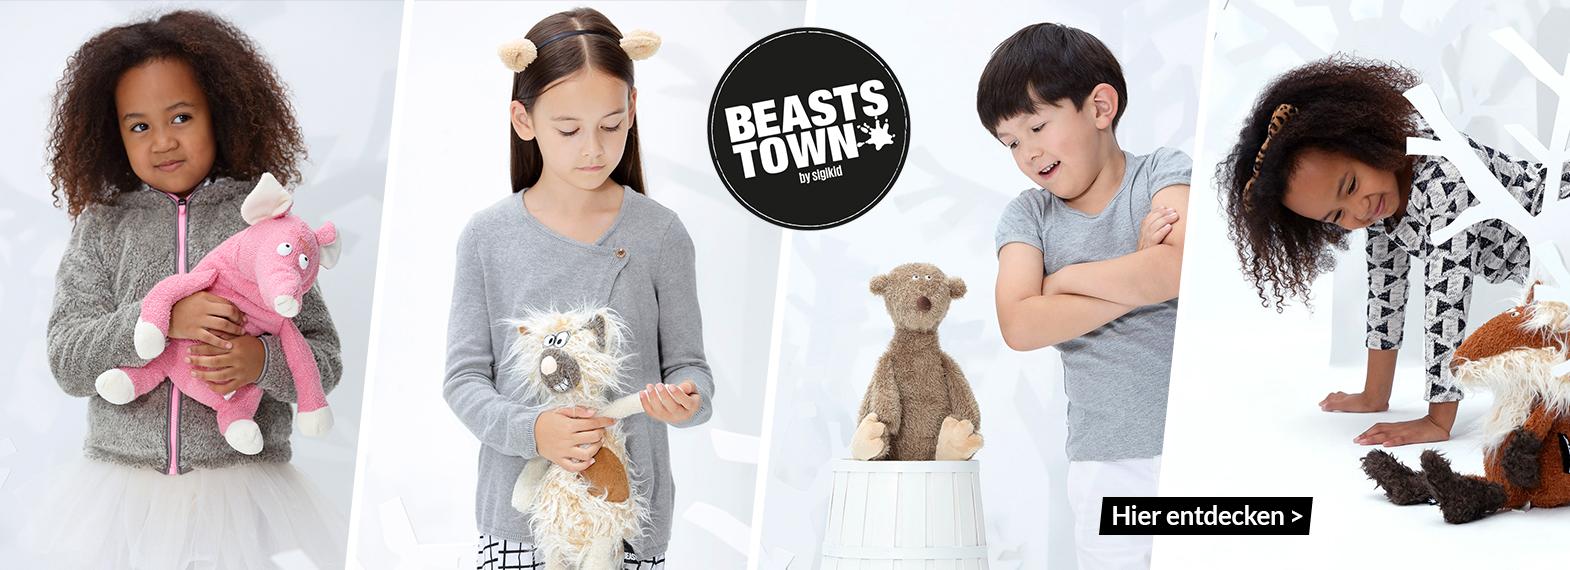 Spielheld sigikid Beasts